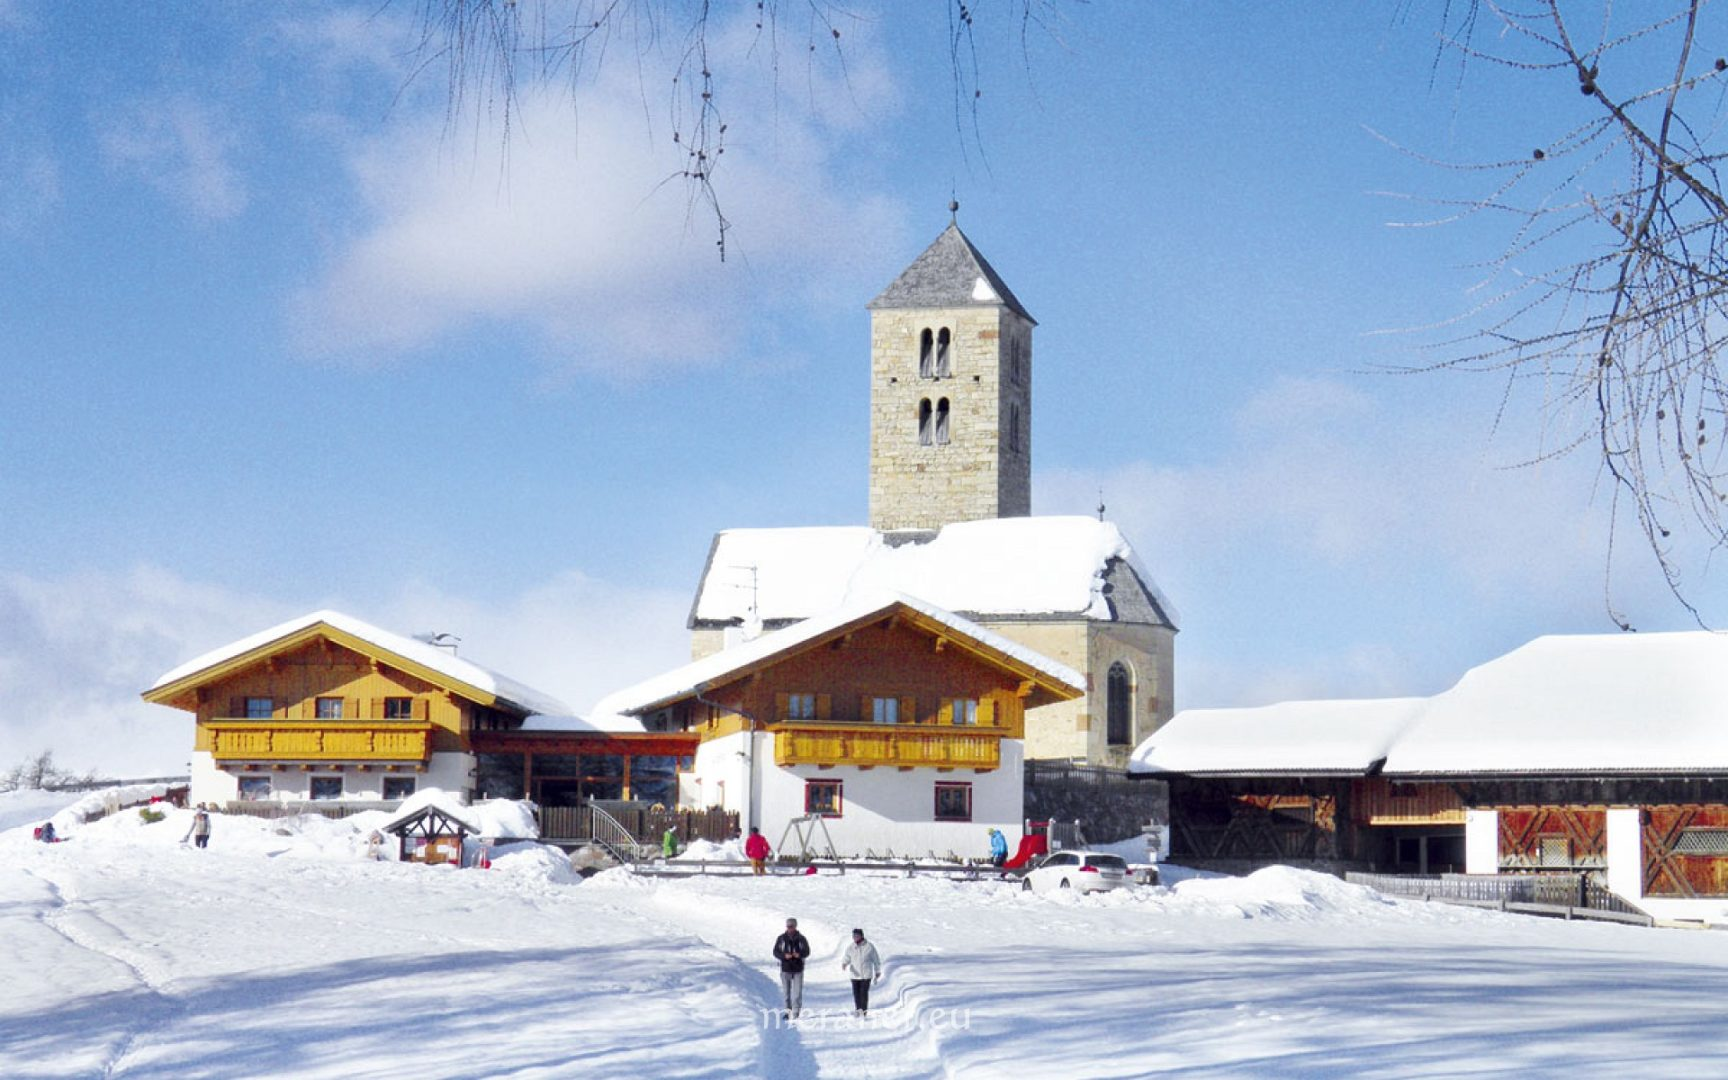 920 Wa Langfenn 1 - Winterparadies